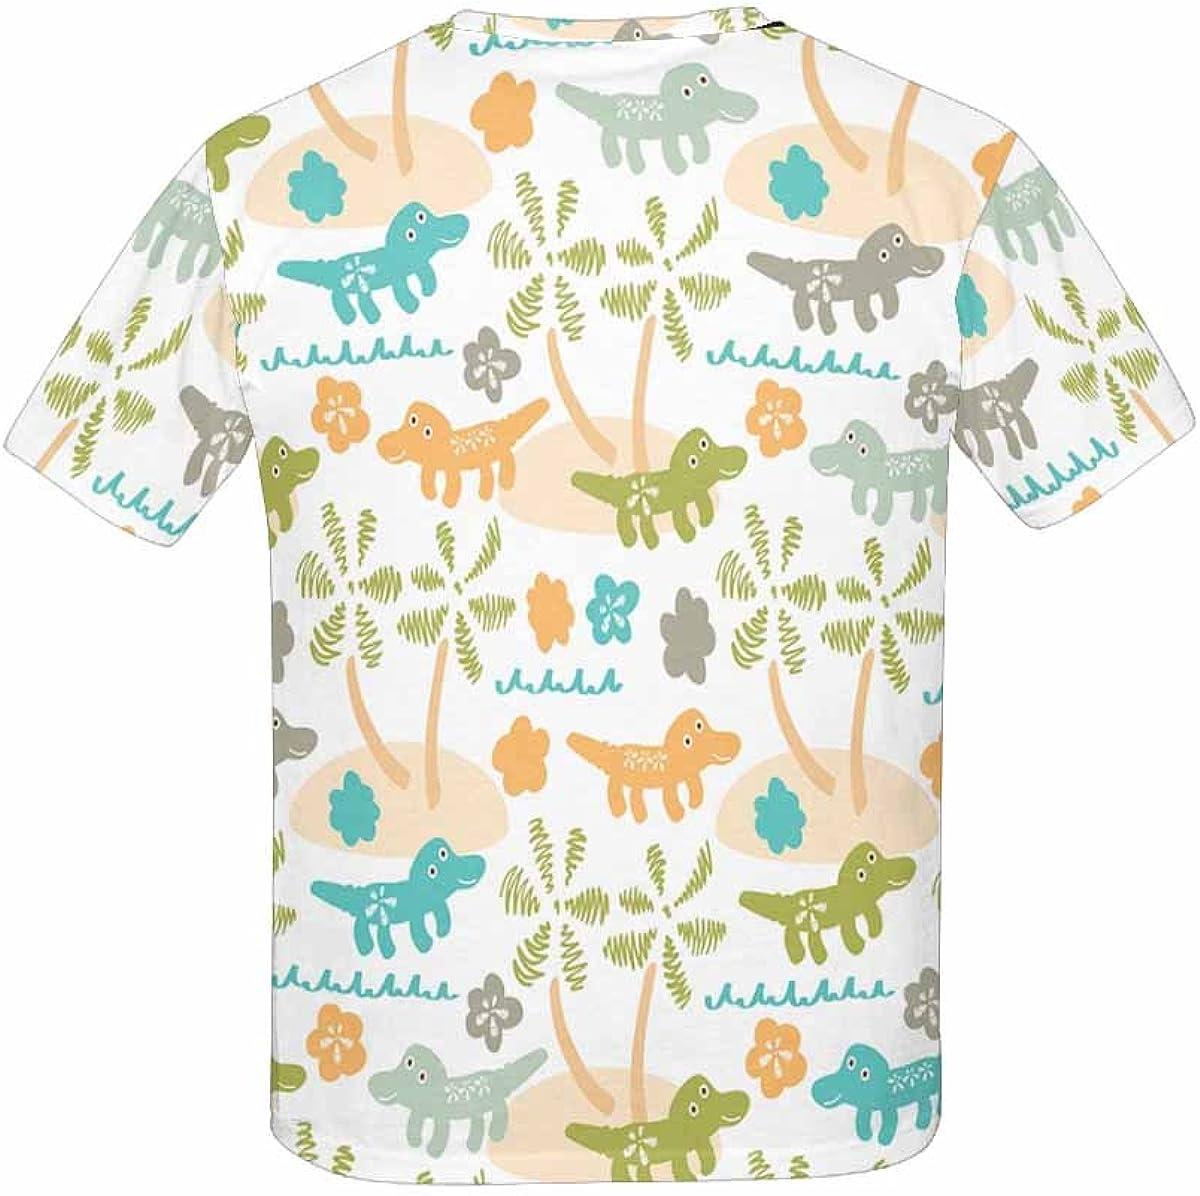 XS-XL INTERESTPRINT Youth T-Shirts Dinosaur in Cartoon Style